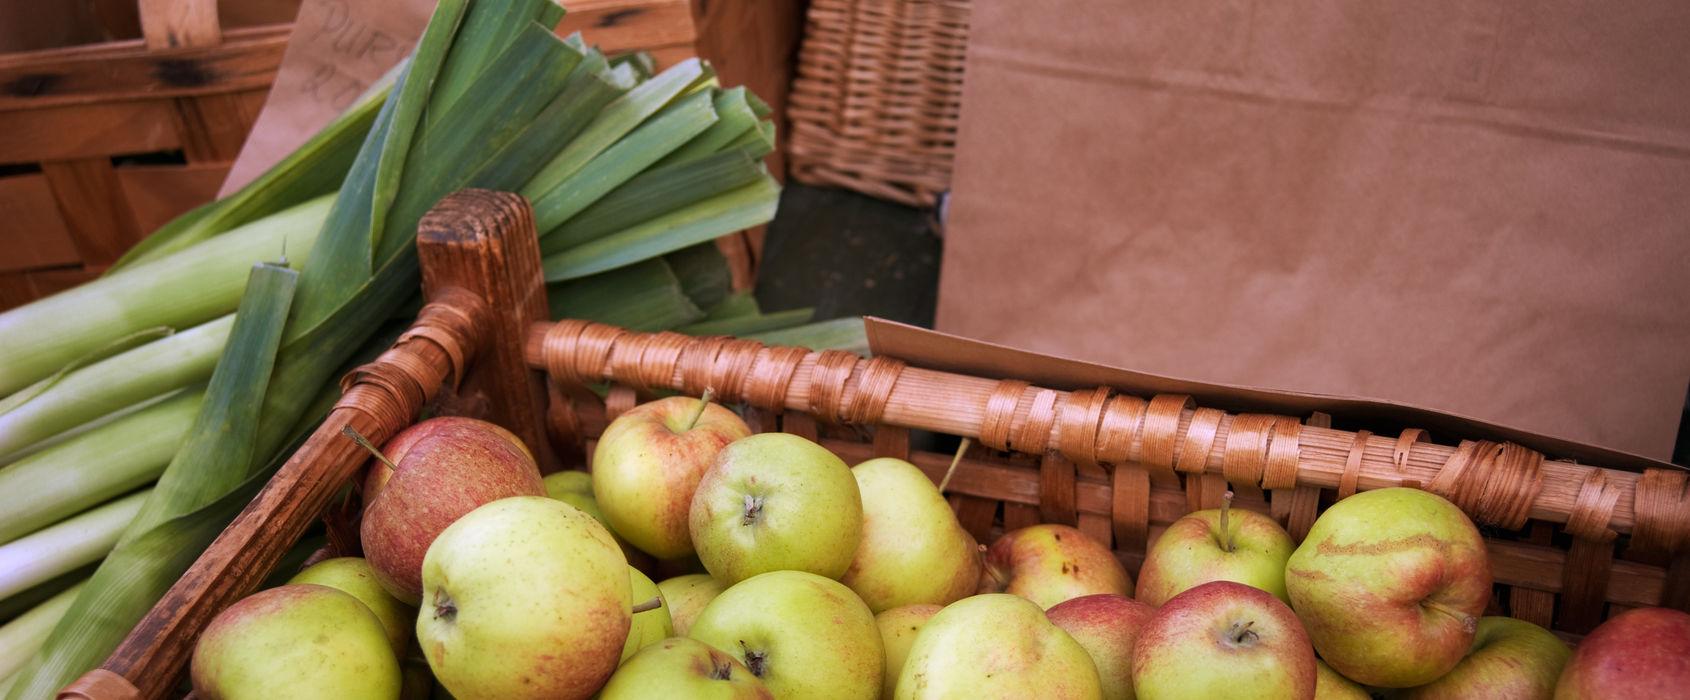 En korg med äpplen, Skansen